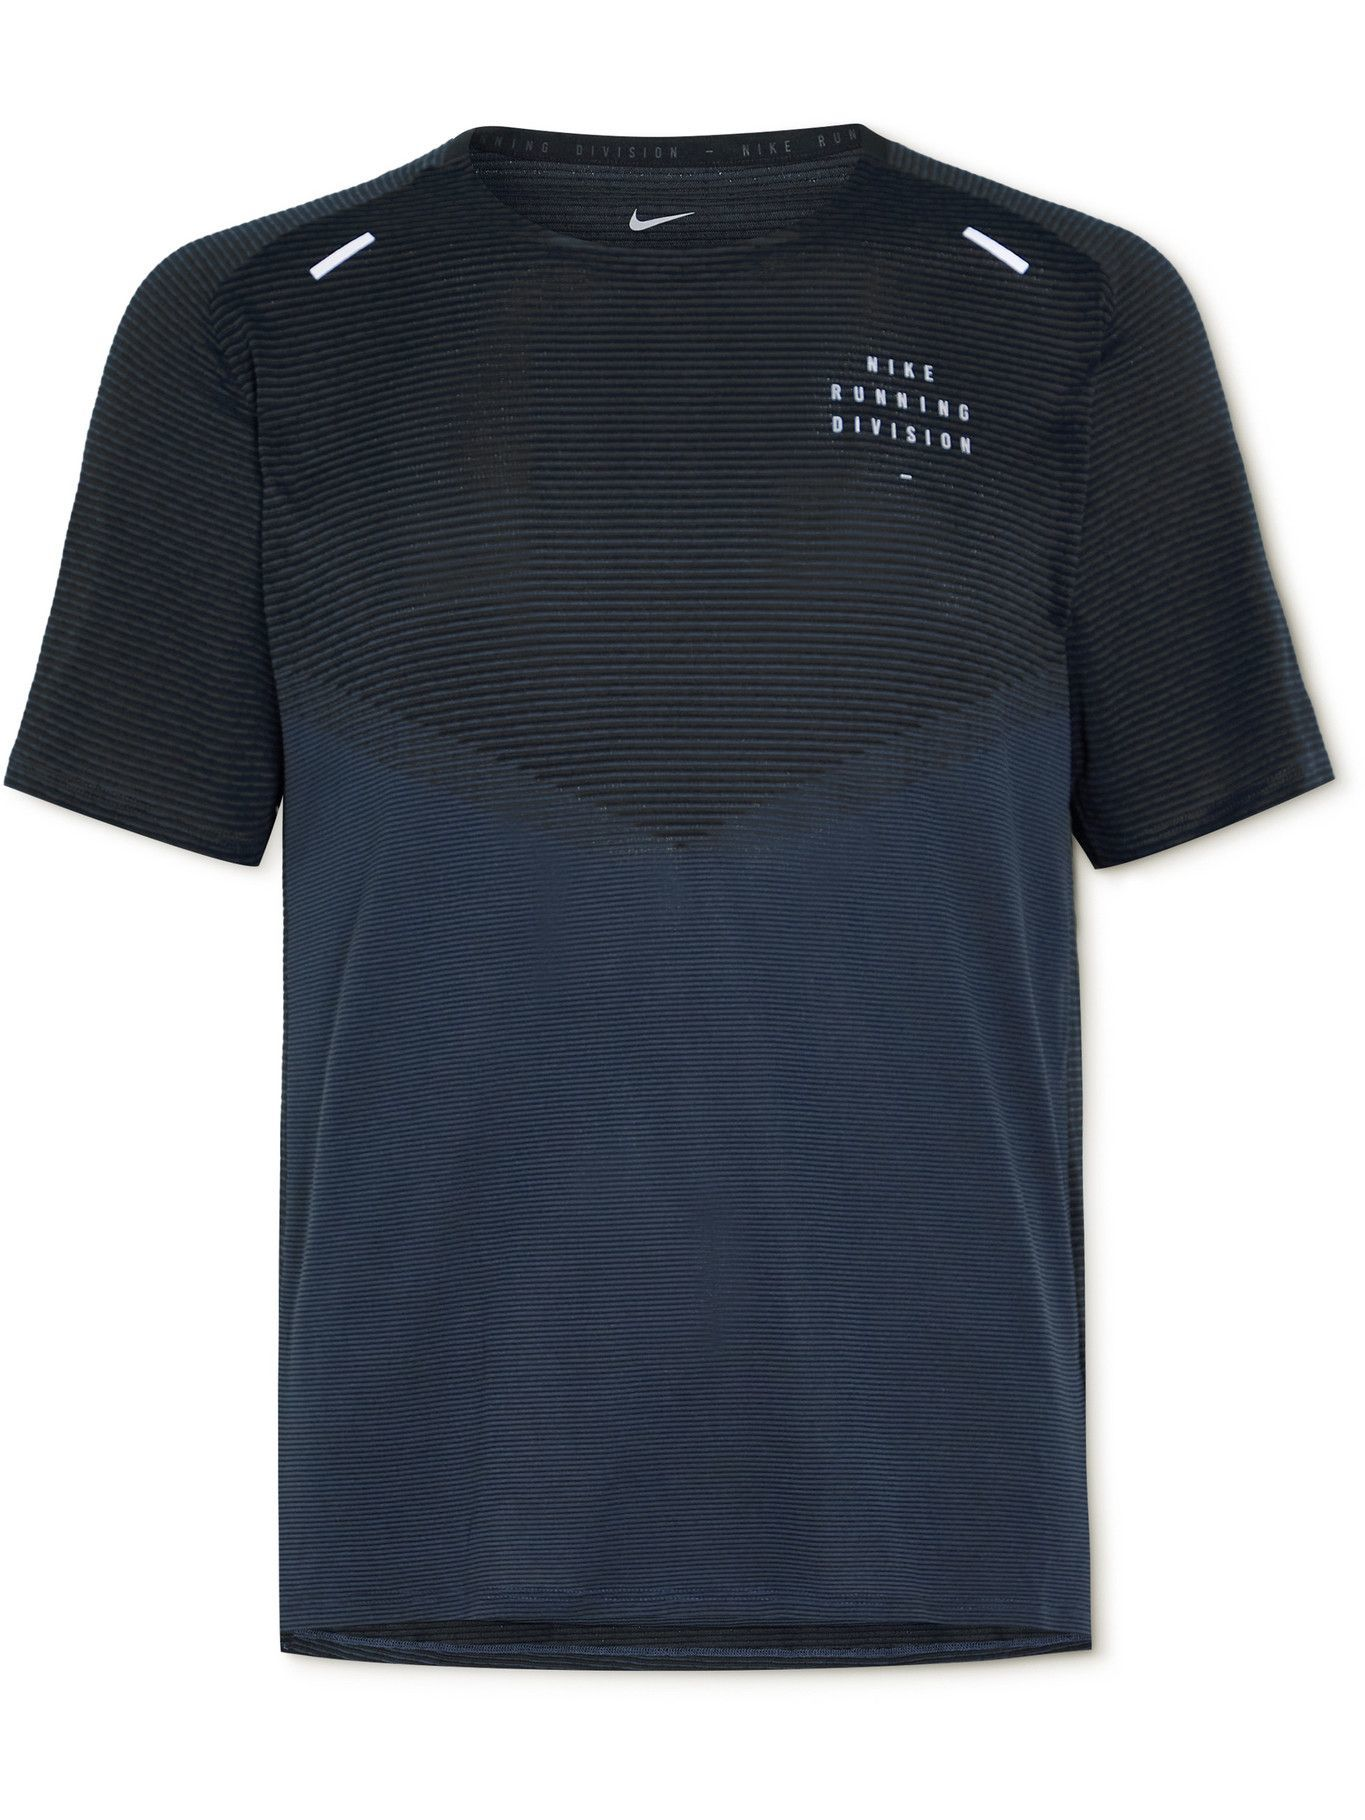 Photo: Nike Running - ADV Run Division Techknit Dri-FIT T-Shirt - Black